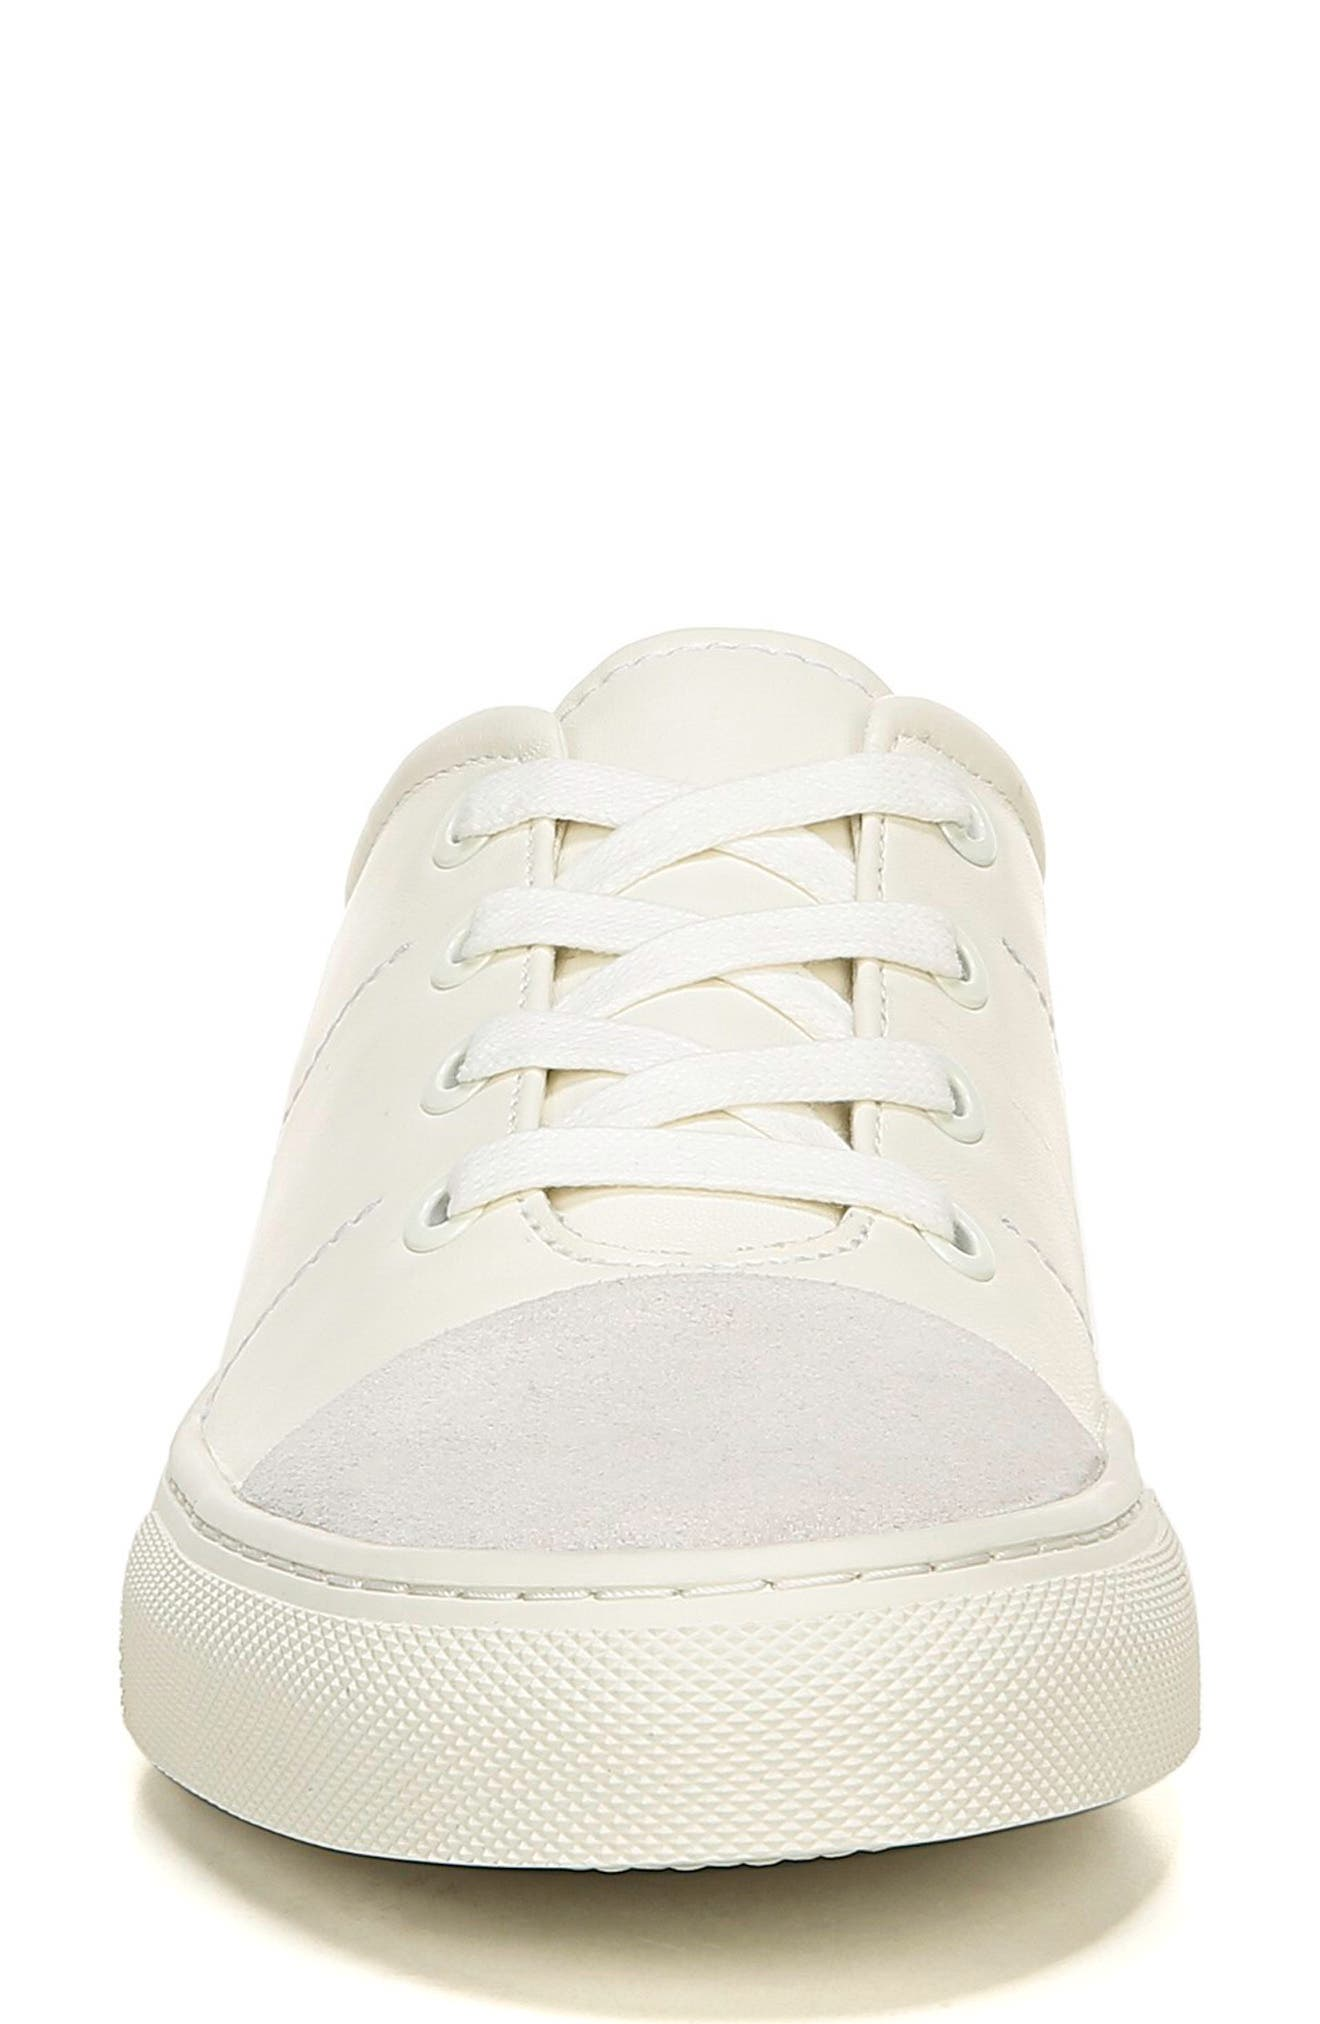 Via Spiga | Sybil Lace-Up Sneaker